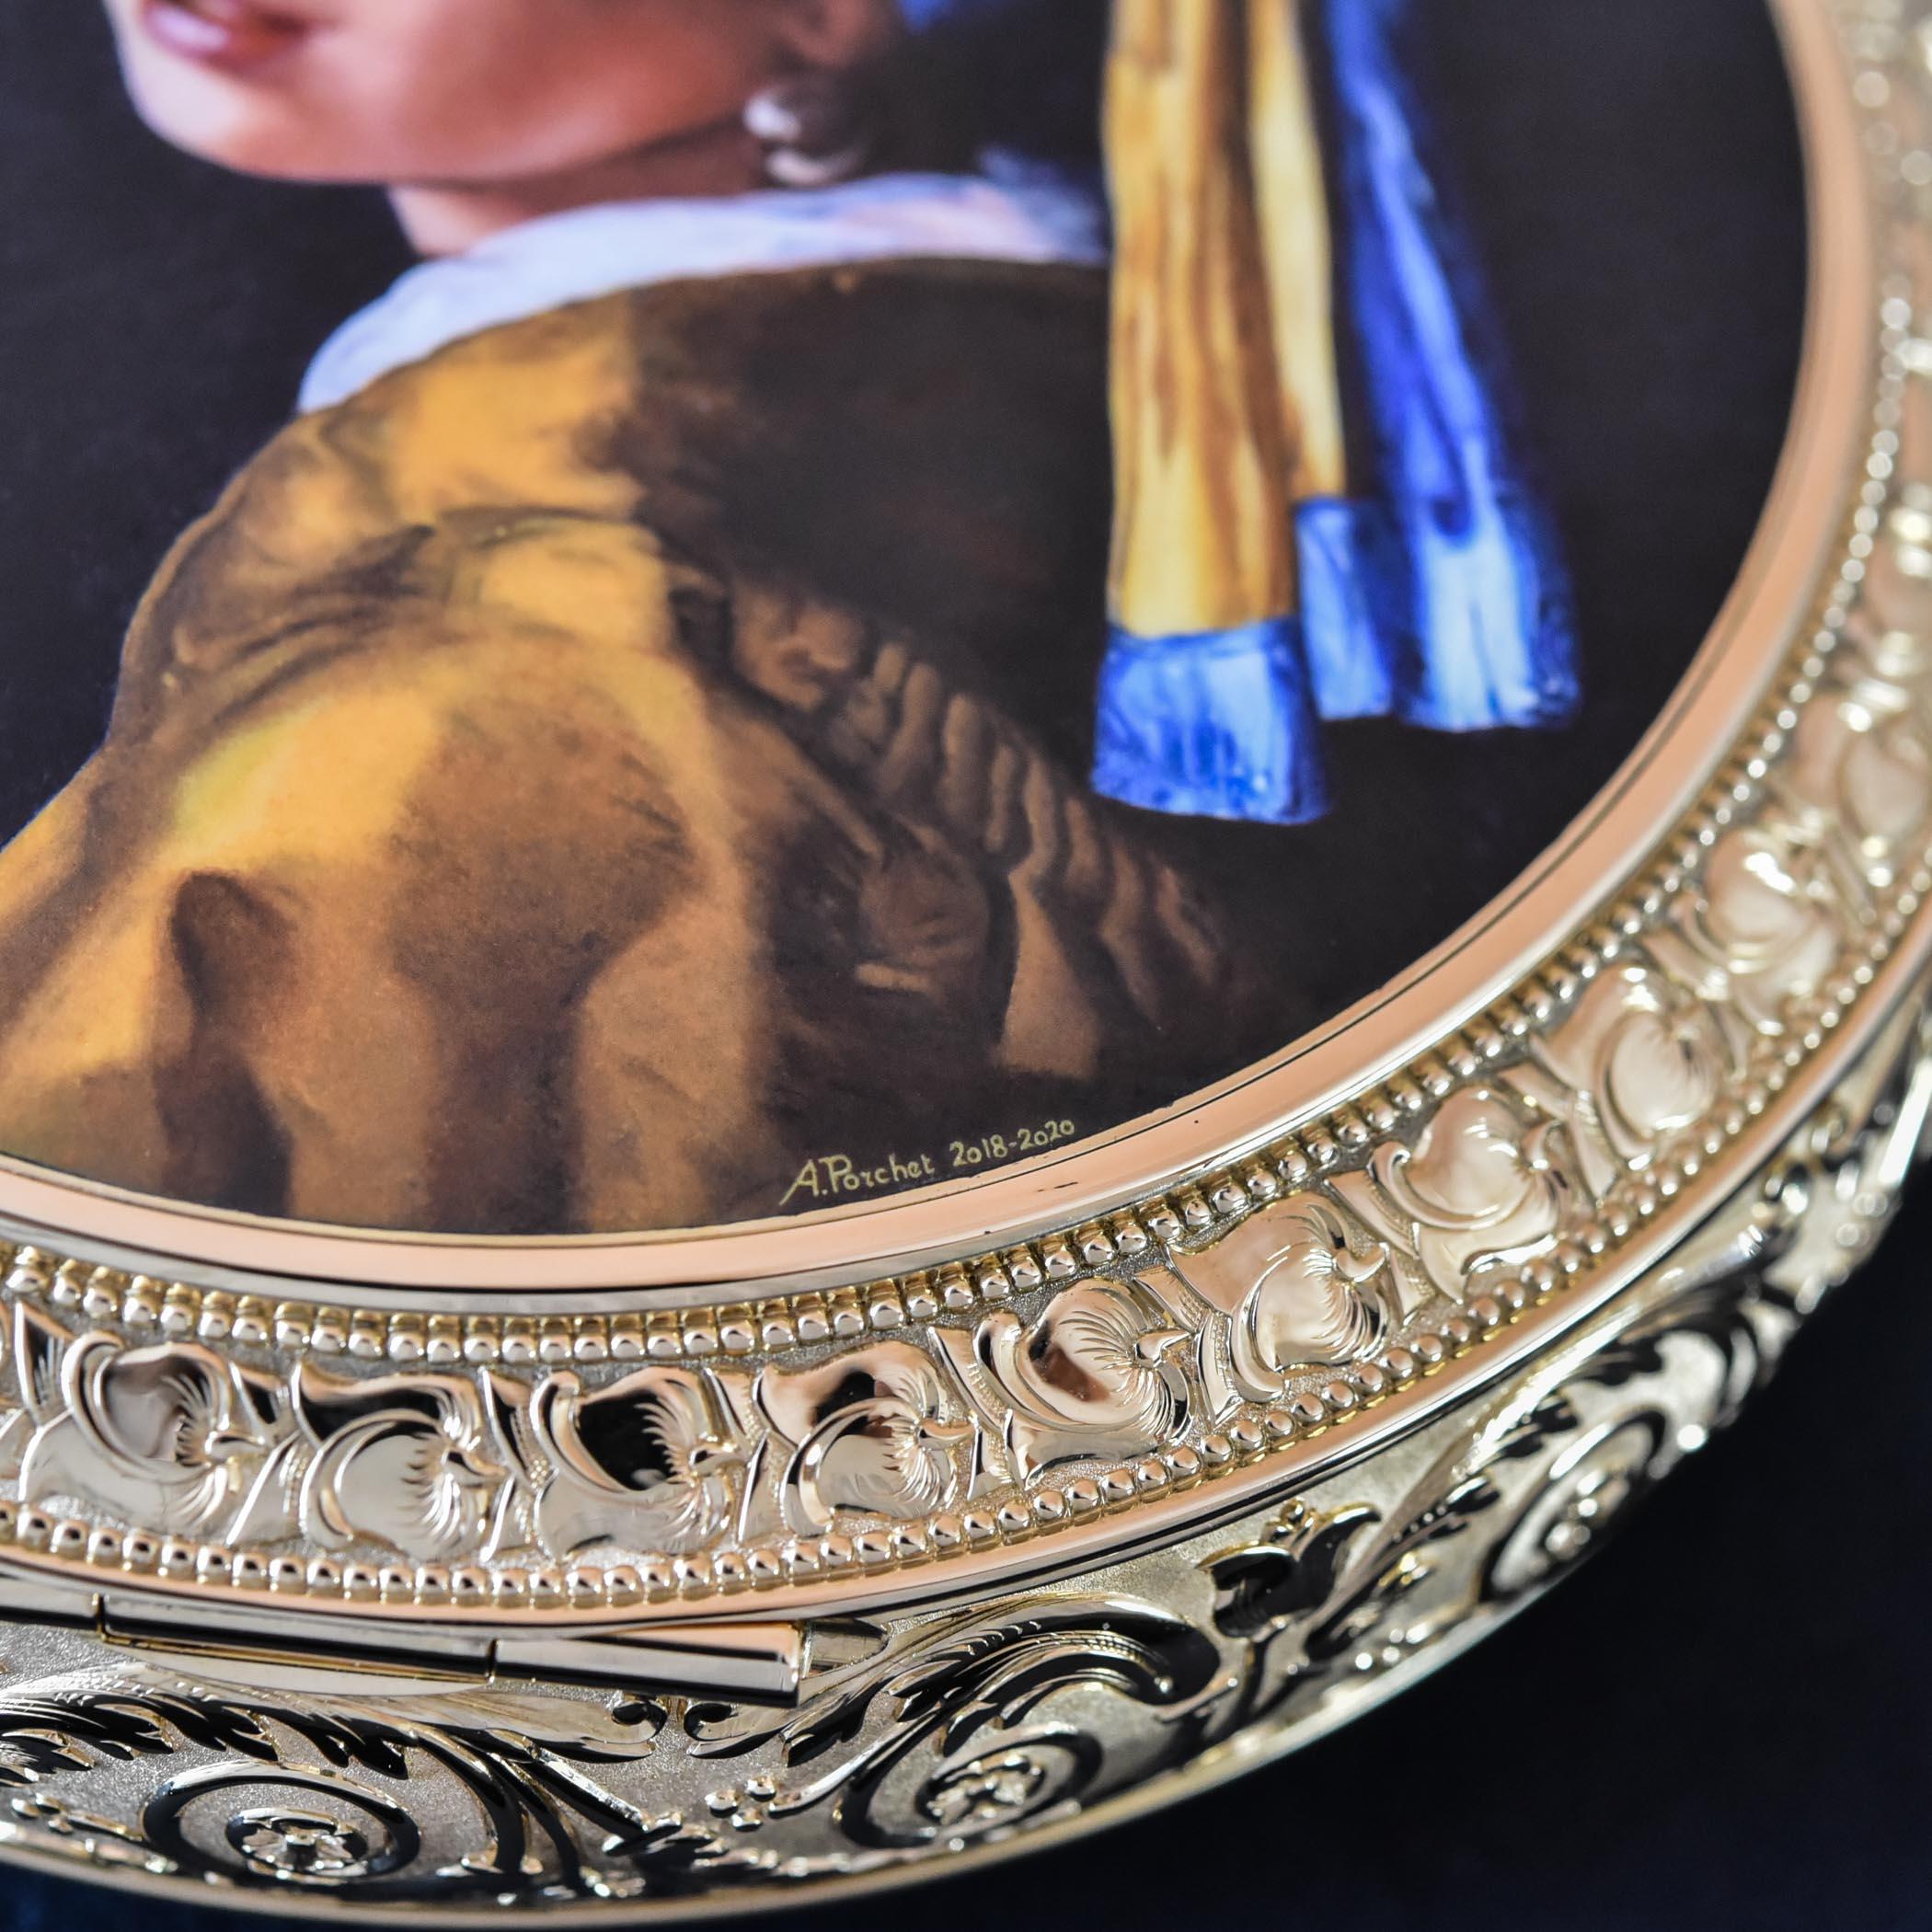 Vacheron Constantin Les Cabinotiers Westminster Sonnerie Tribute to Johannes Vermeer Pocket Watch